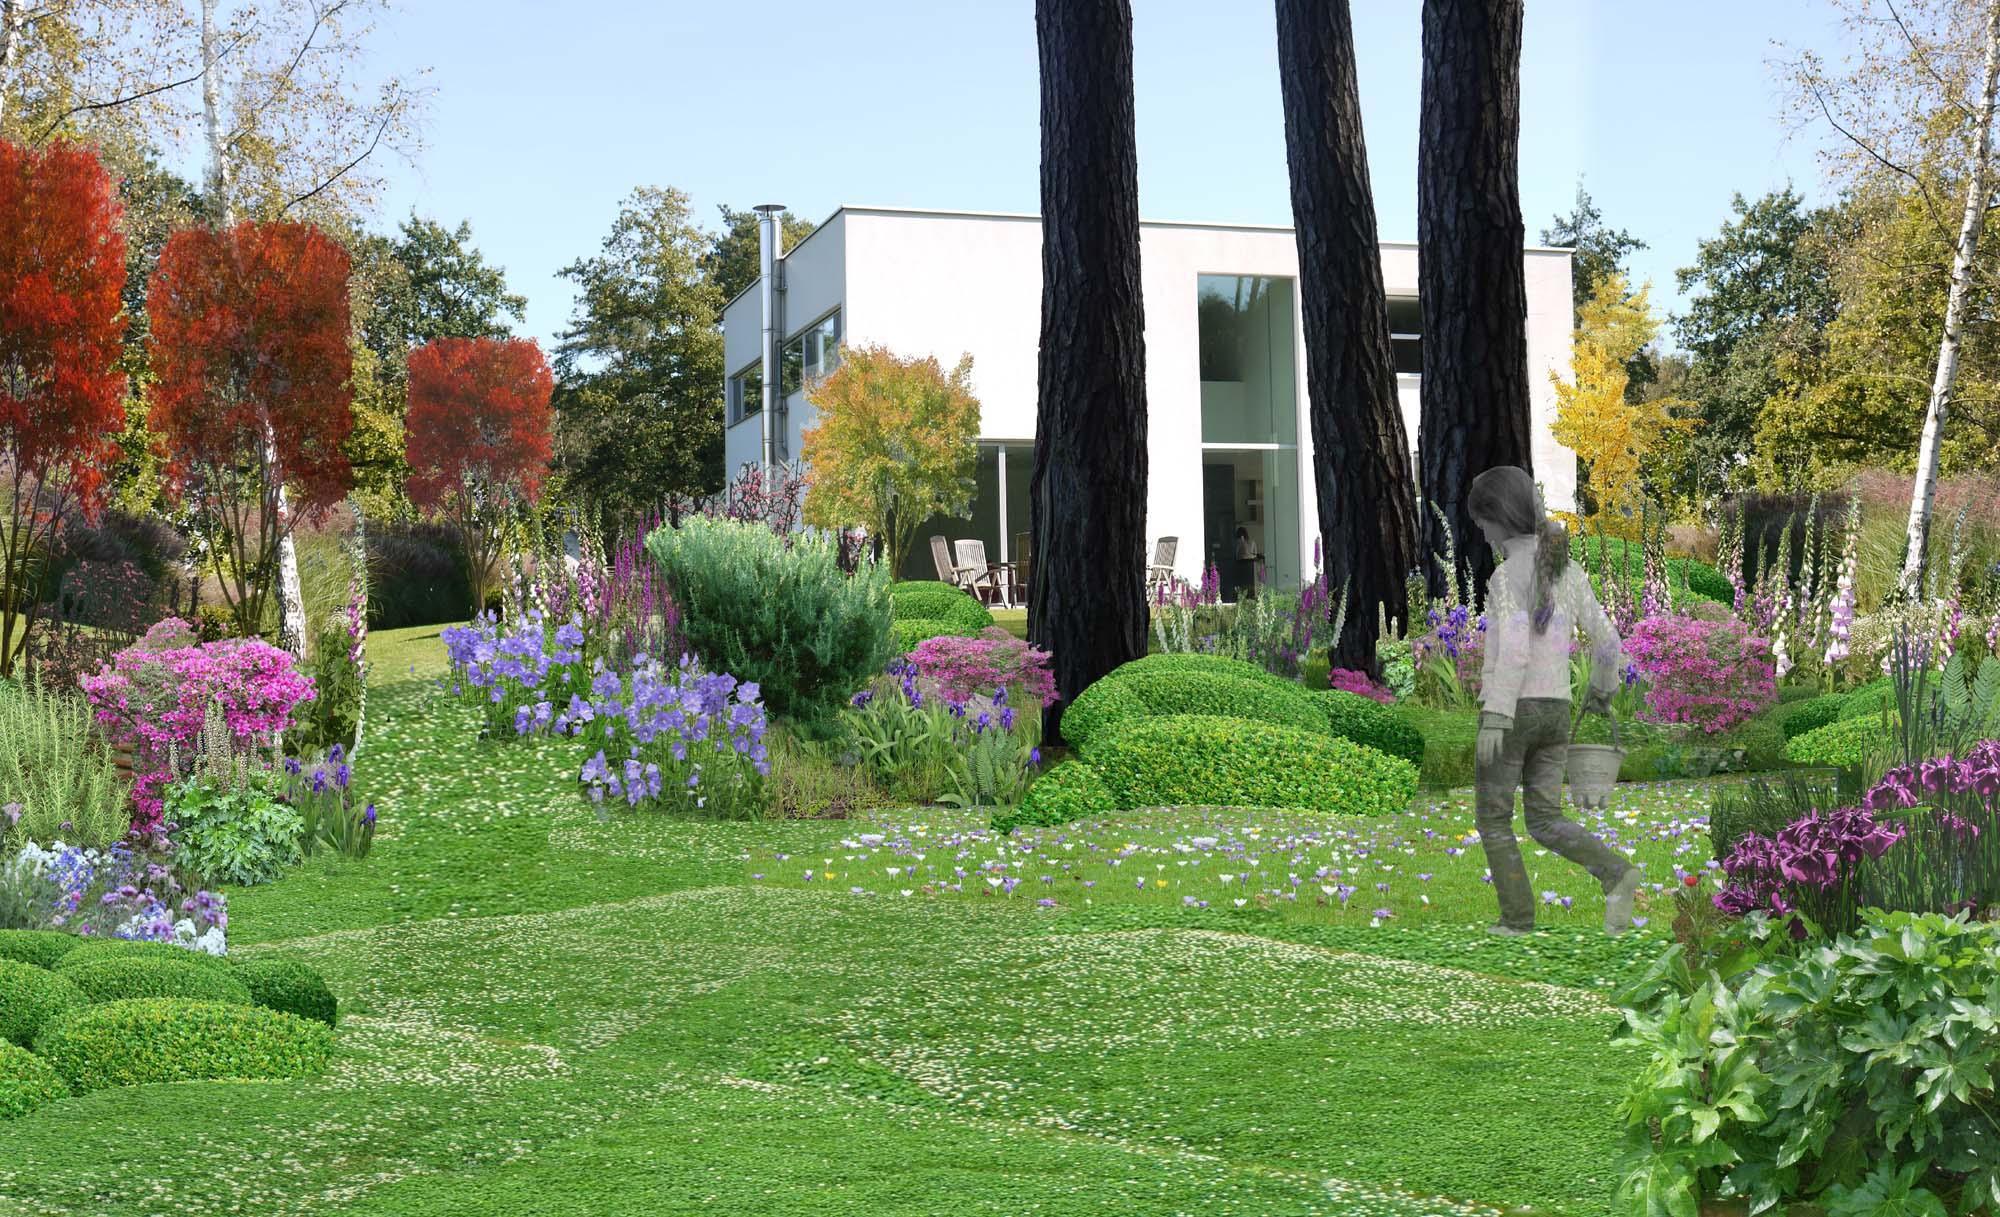 Kabinet pepijn verheyen moderne tuin in 2016 kabinet for Moderne tuin